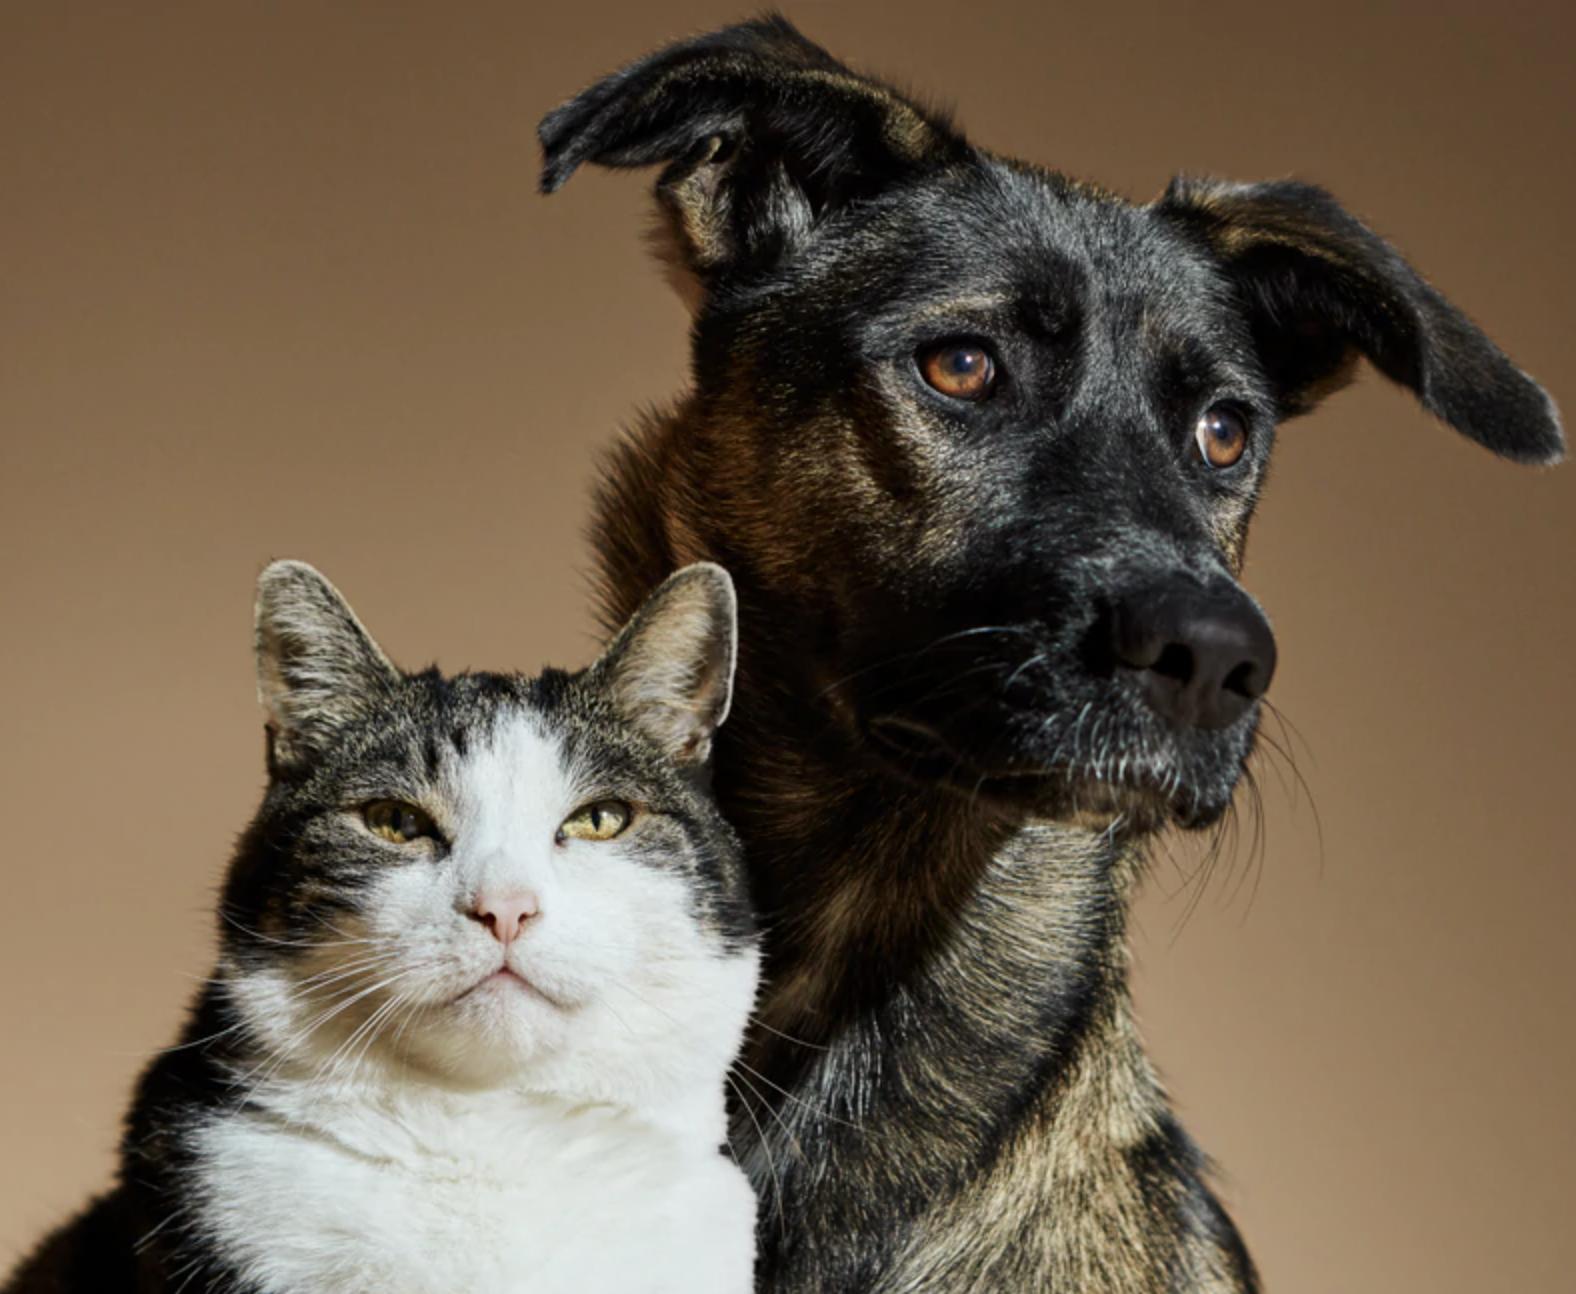 Companion Animal For Life - projekt nadácie Capellino